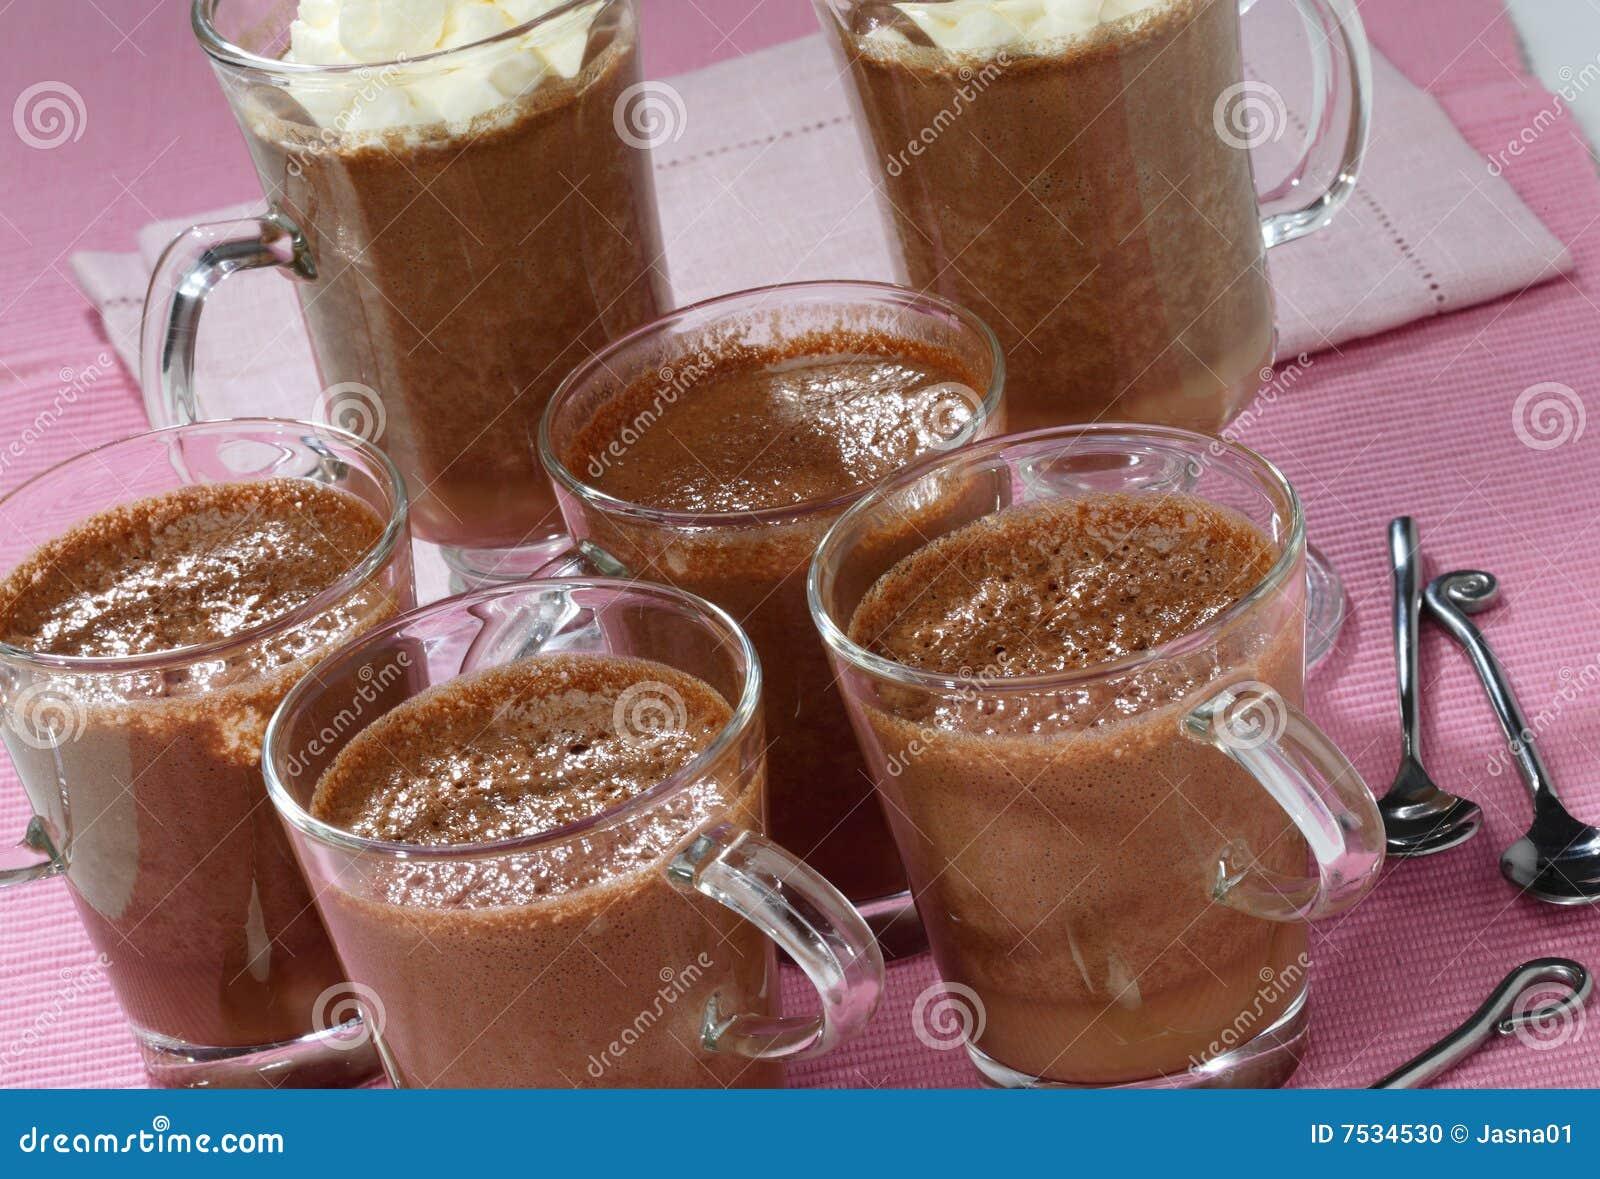 Chocolate Pudding With Cream Stock Photo - Image: 7534530